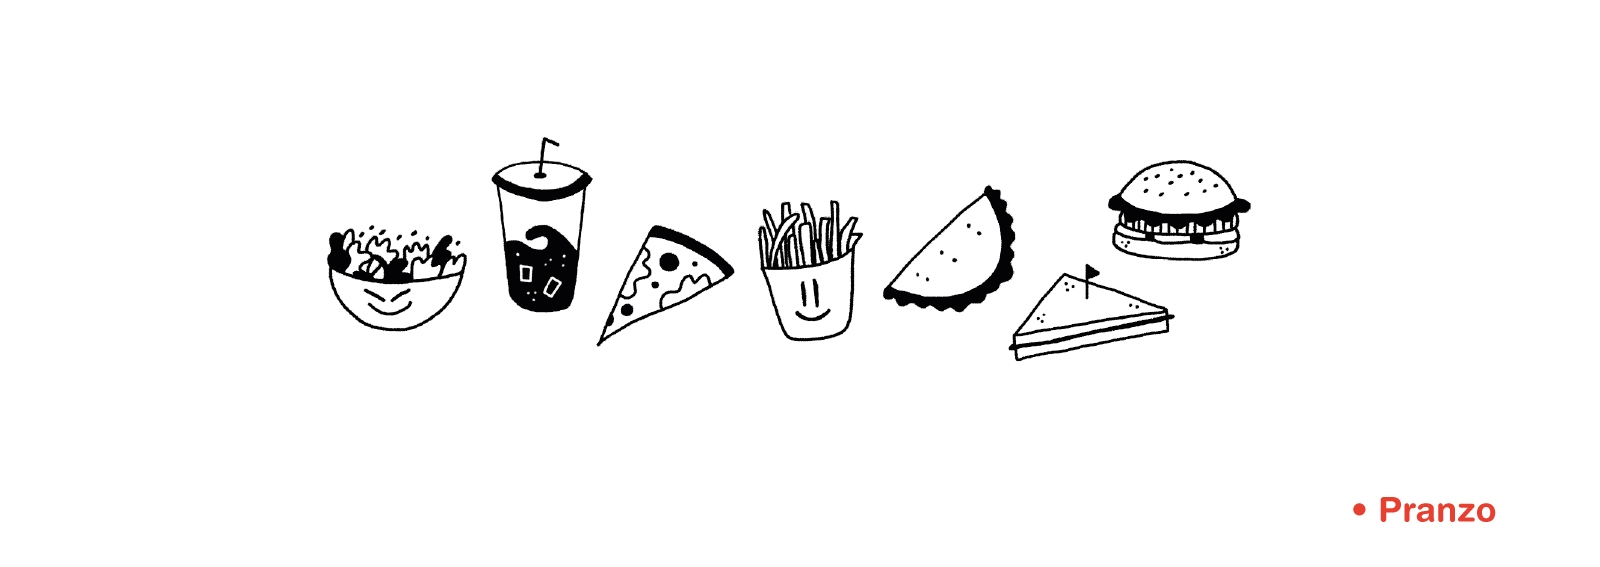 tipiace-pranzo